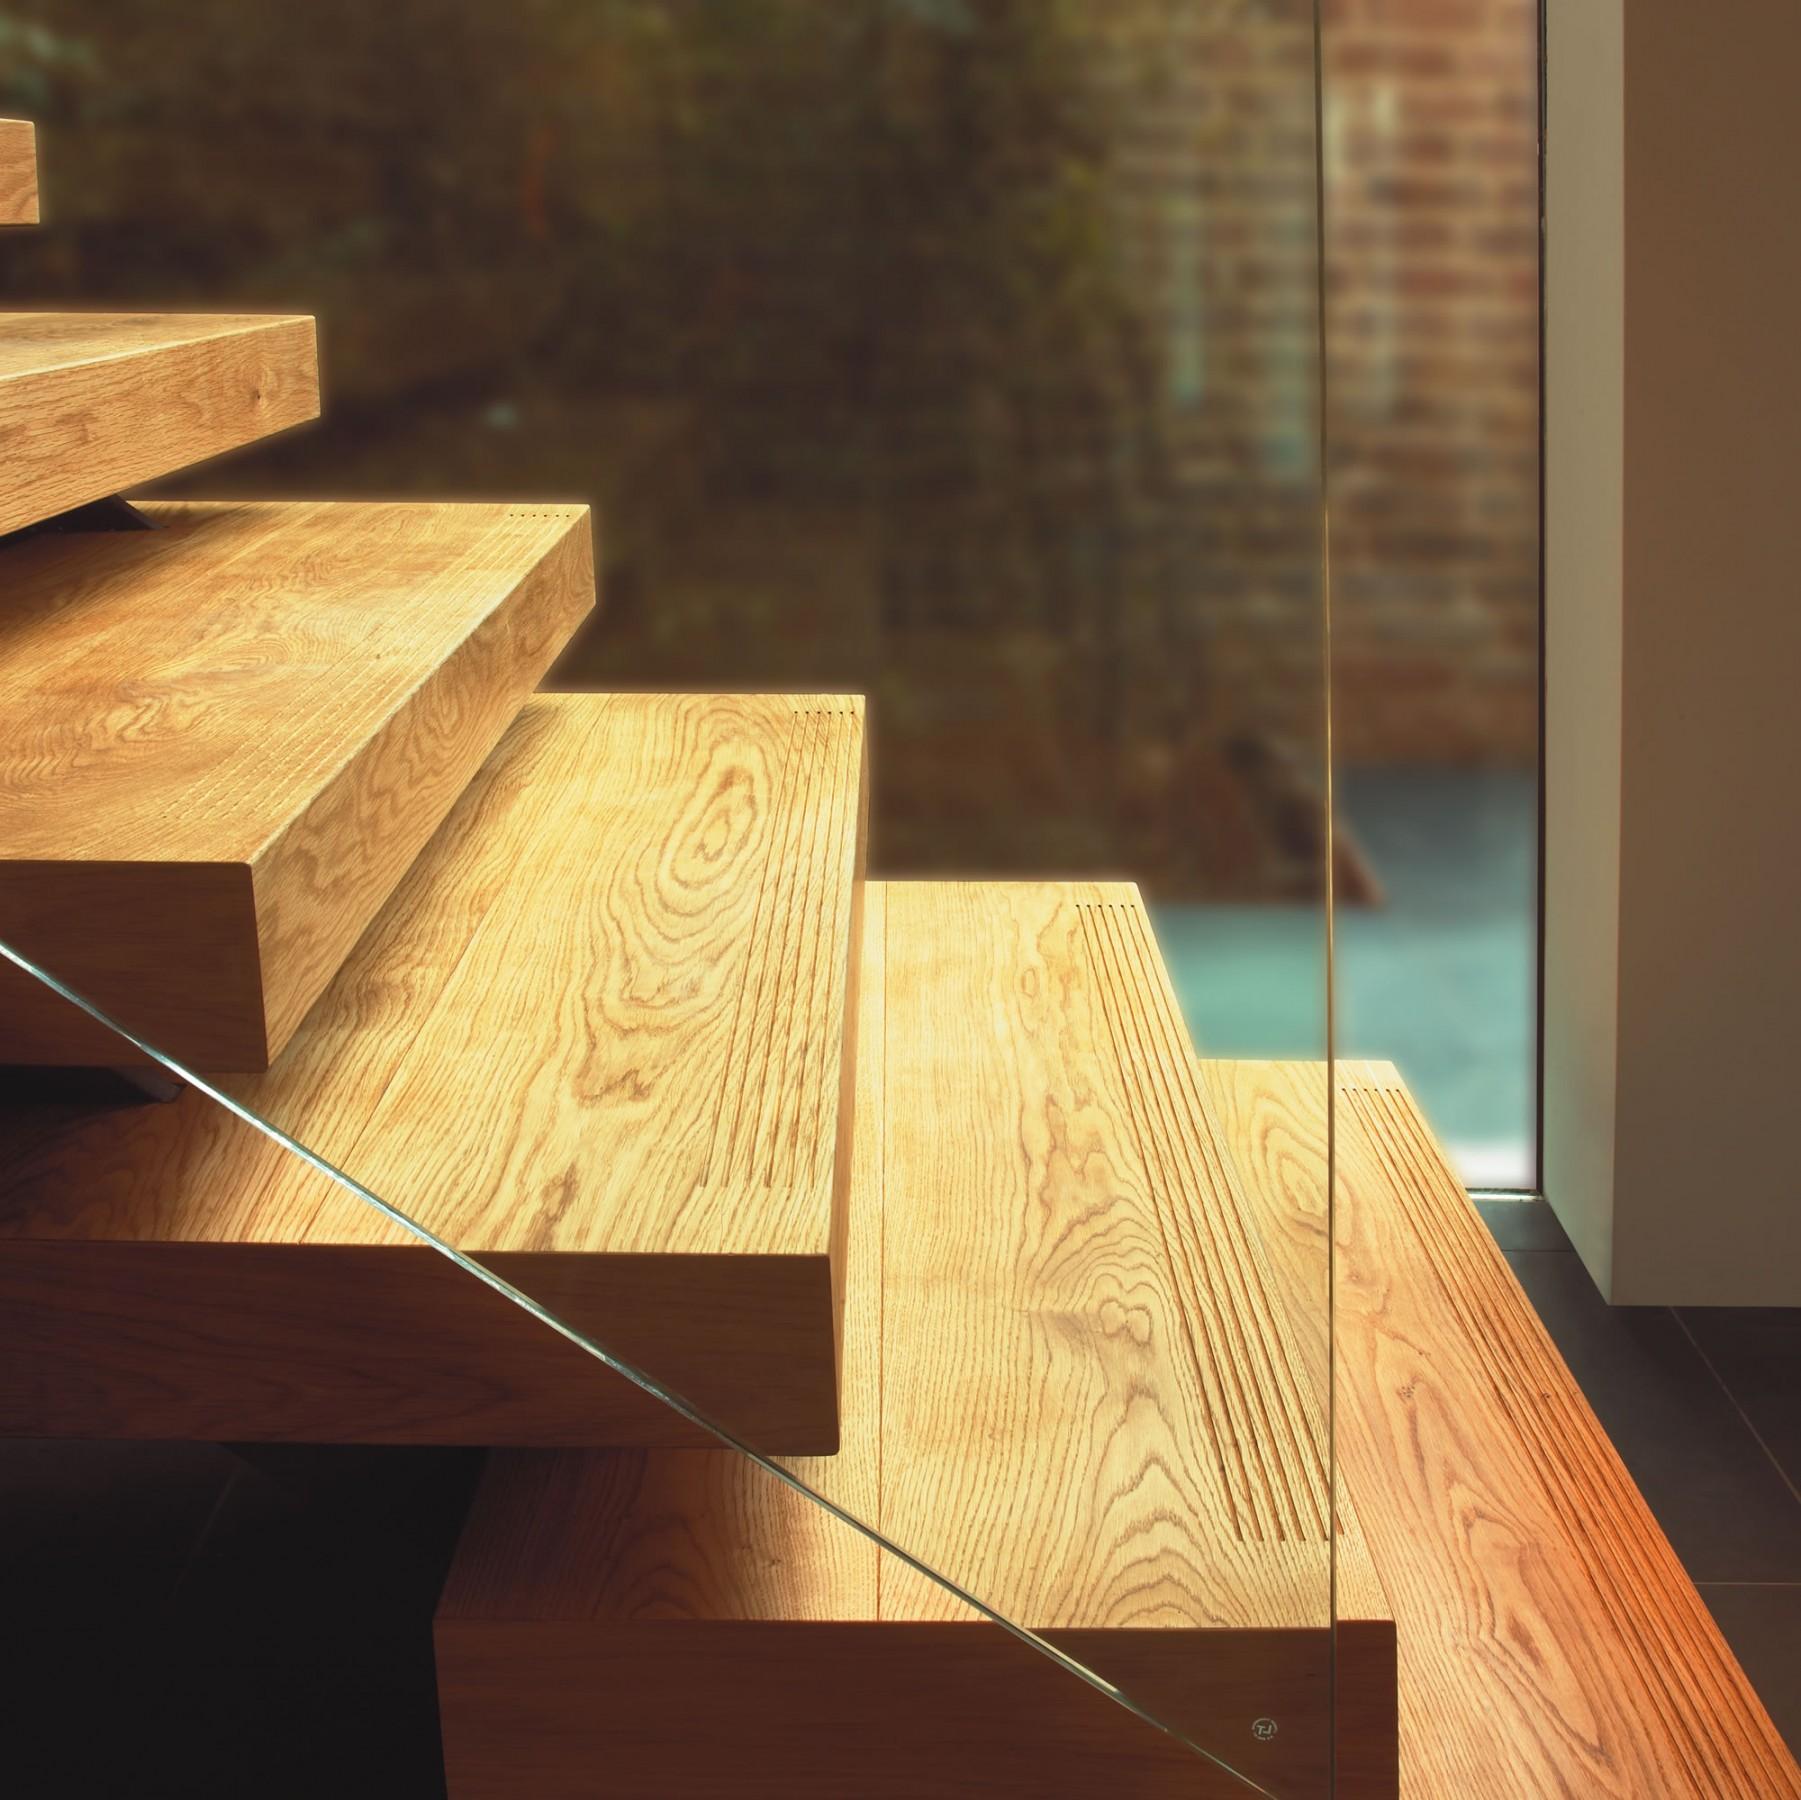 element7-wide-plank-wood-e7-holland-park7-ret2-1801x1800.jpg